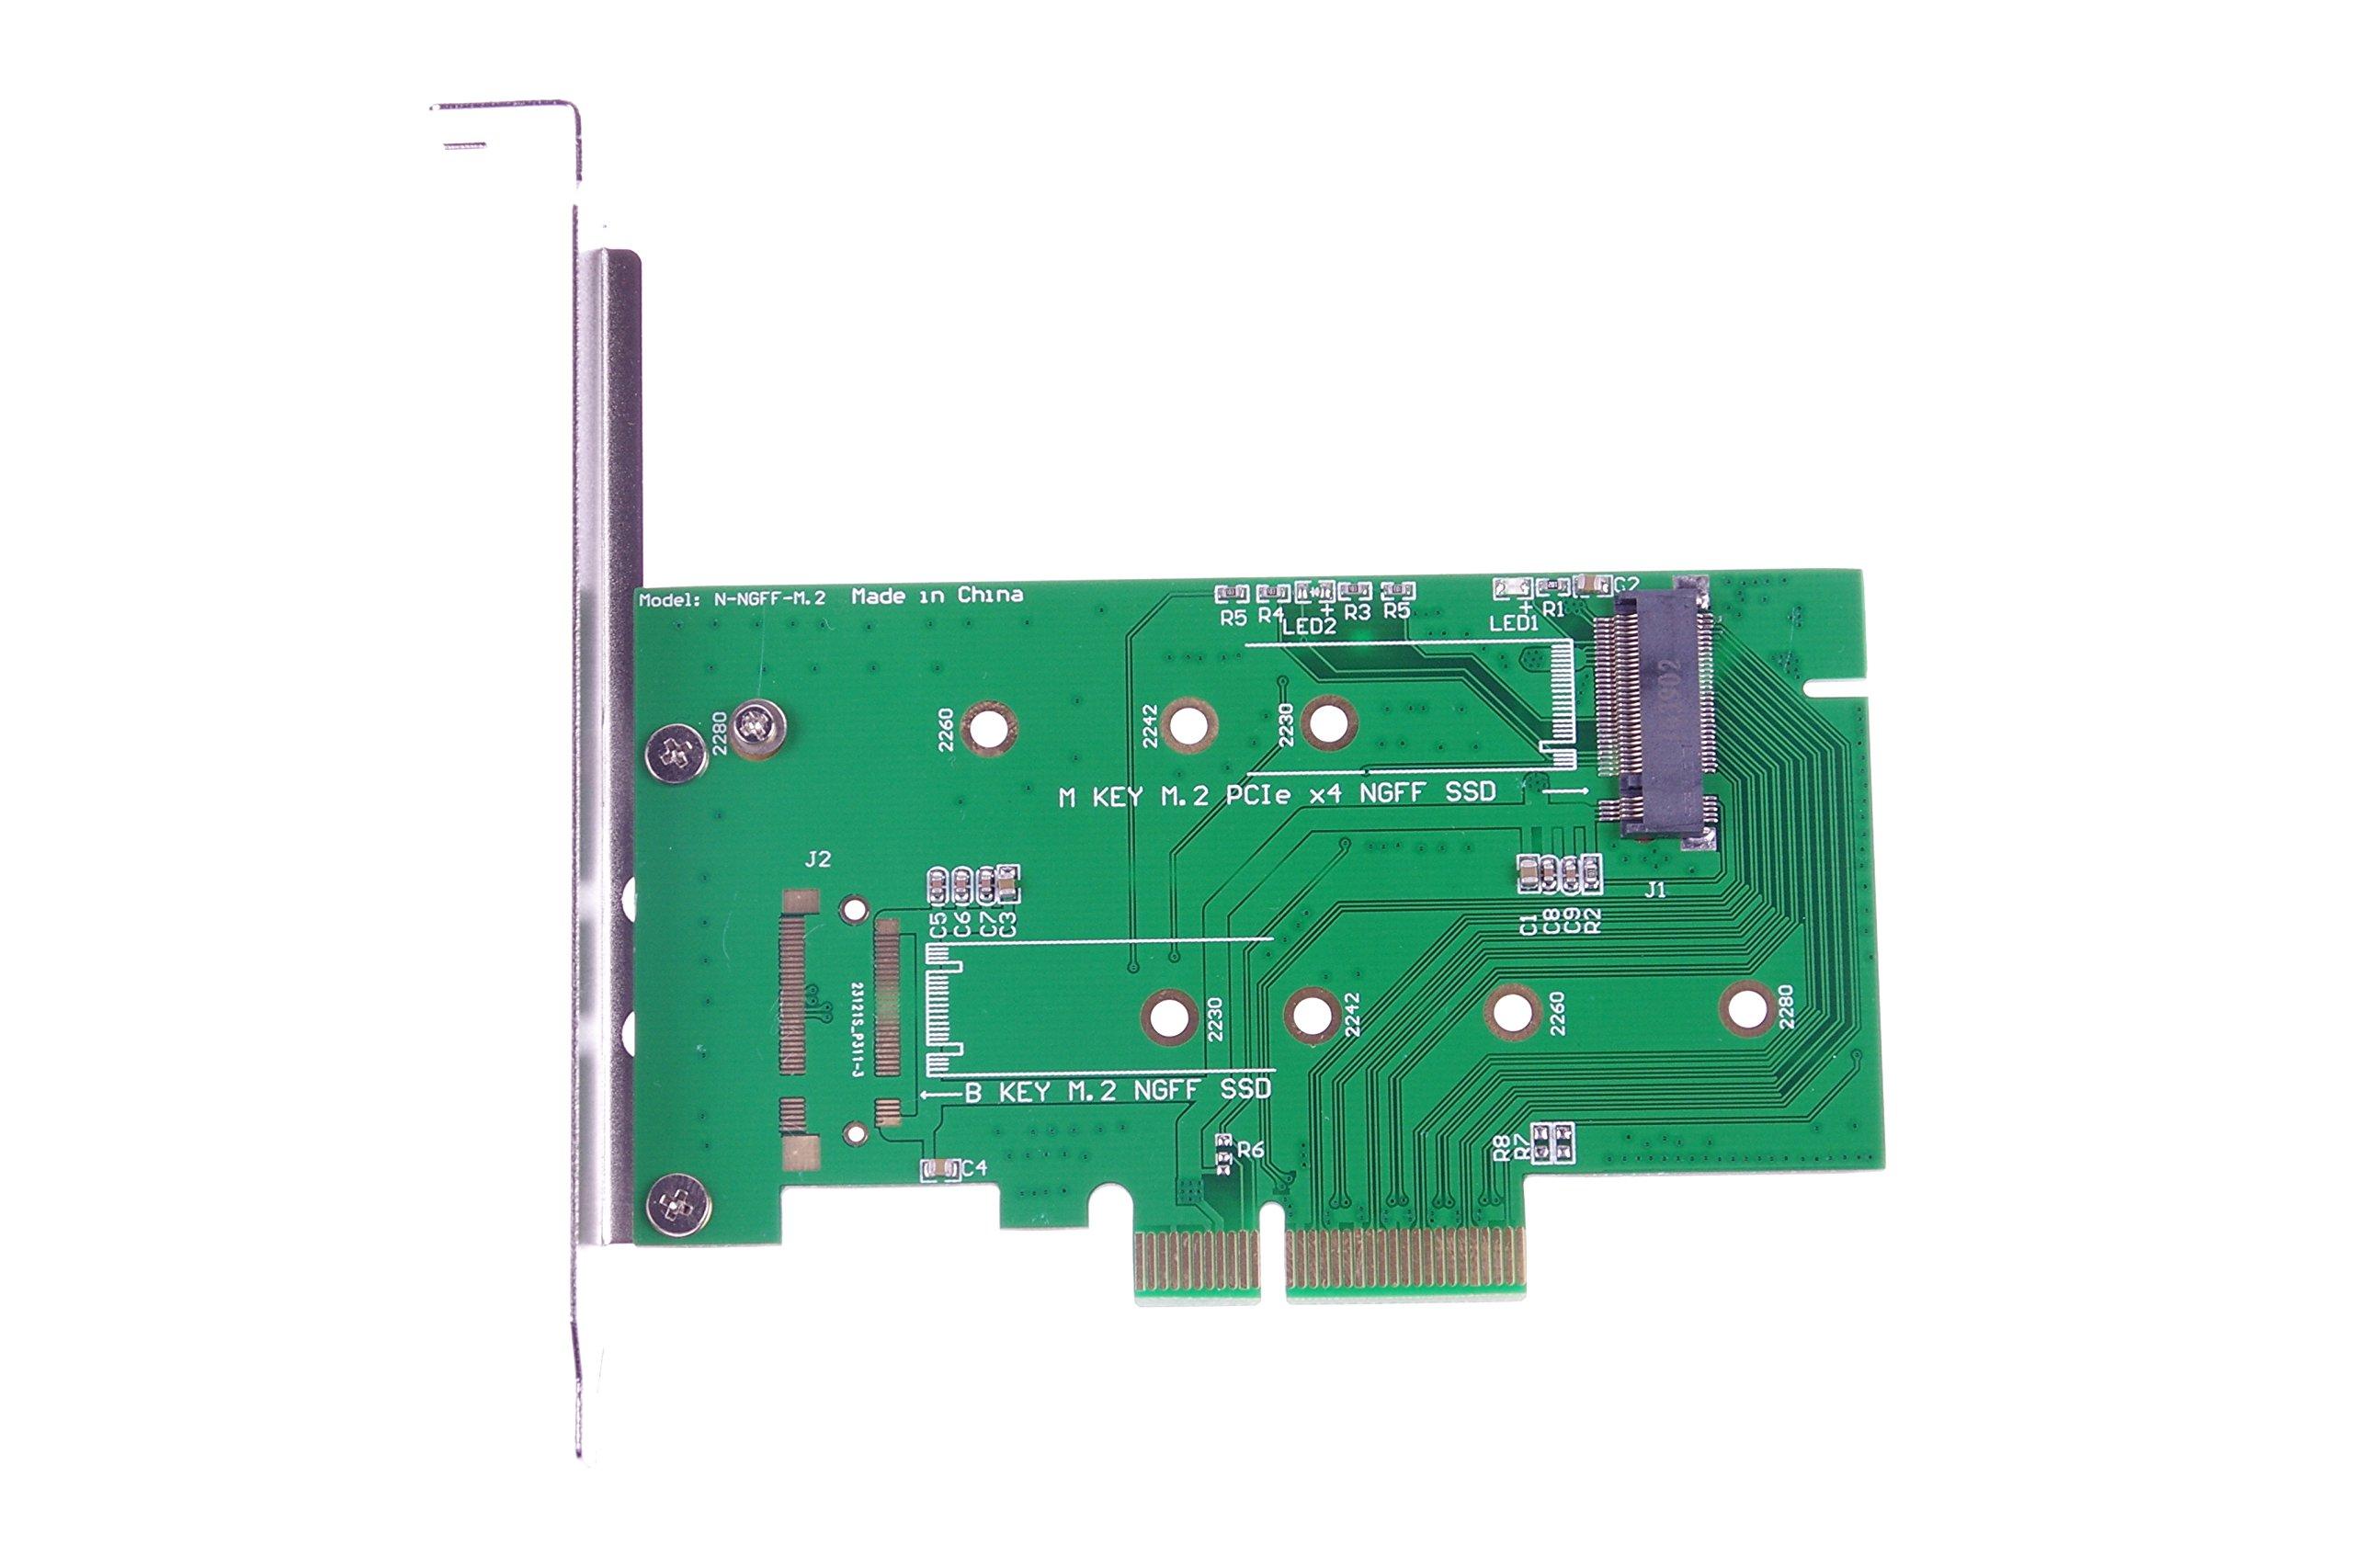 KNACRO M Key M.2 PCIe x4 NGFF SSD/B Key M.2 NGFF SSD To PCI-E x4 Adapter Card for Samsung SP941/SM951/A110/M6E